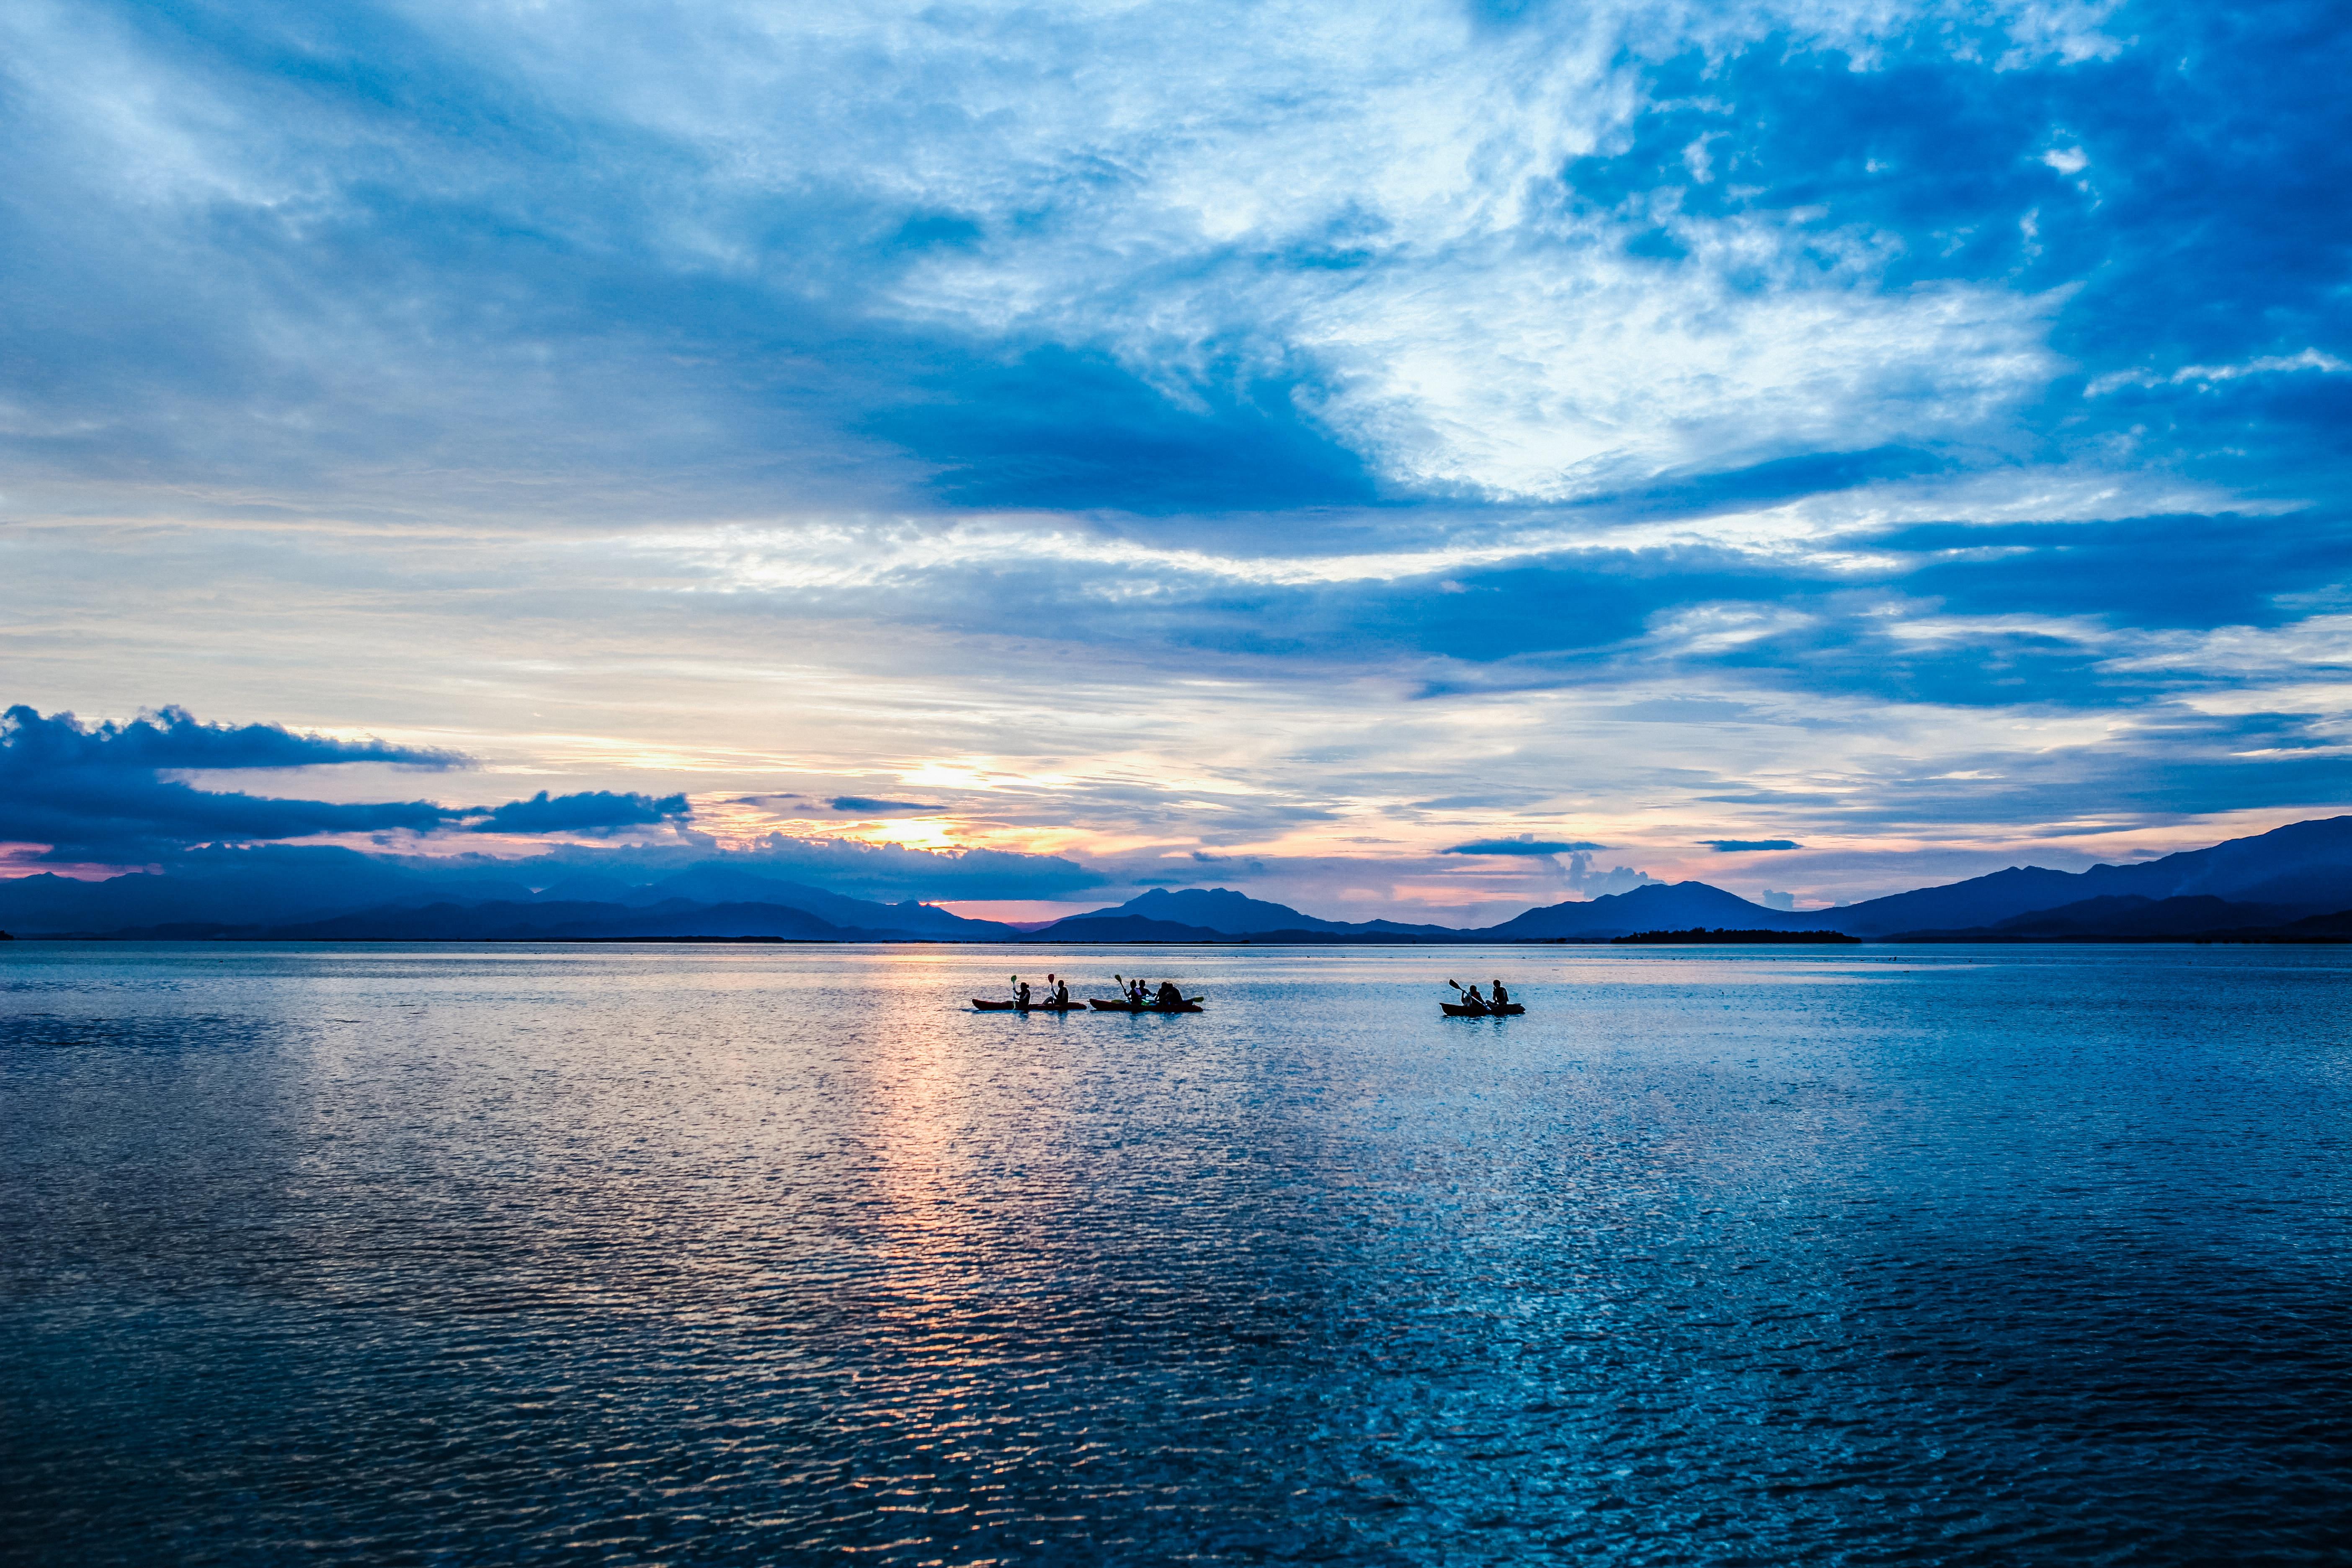 Картинки с красивыми морями и озерами